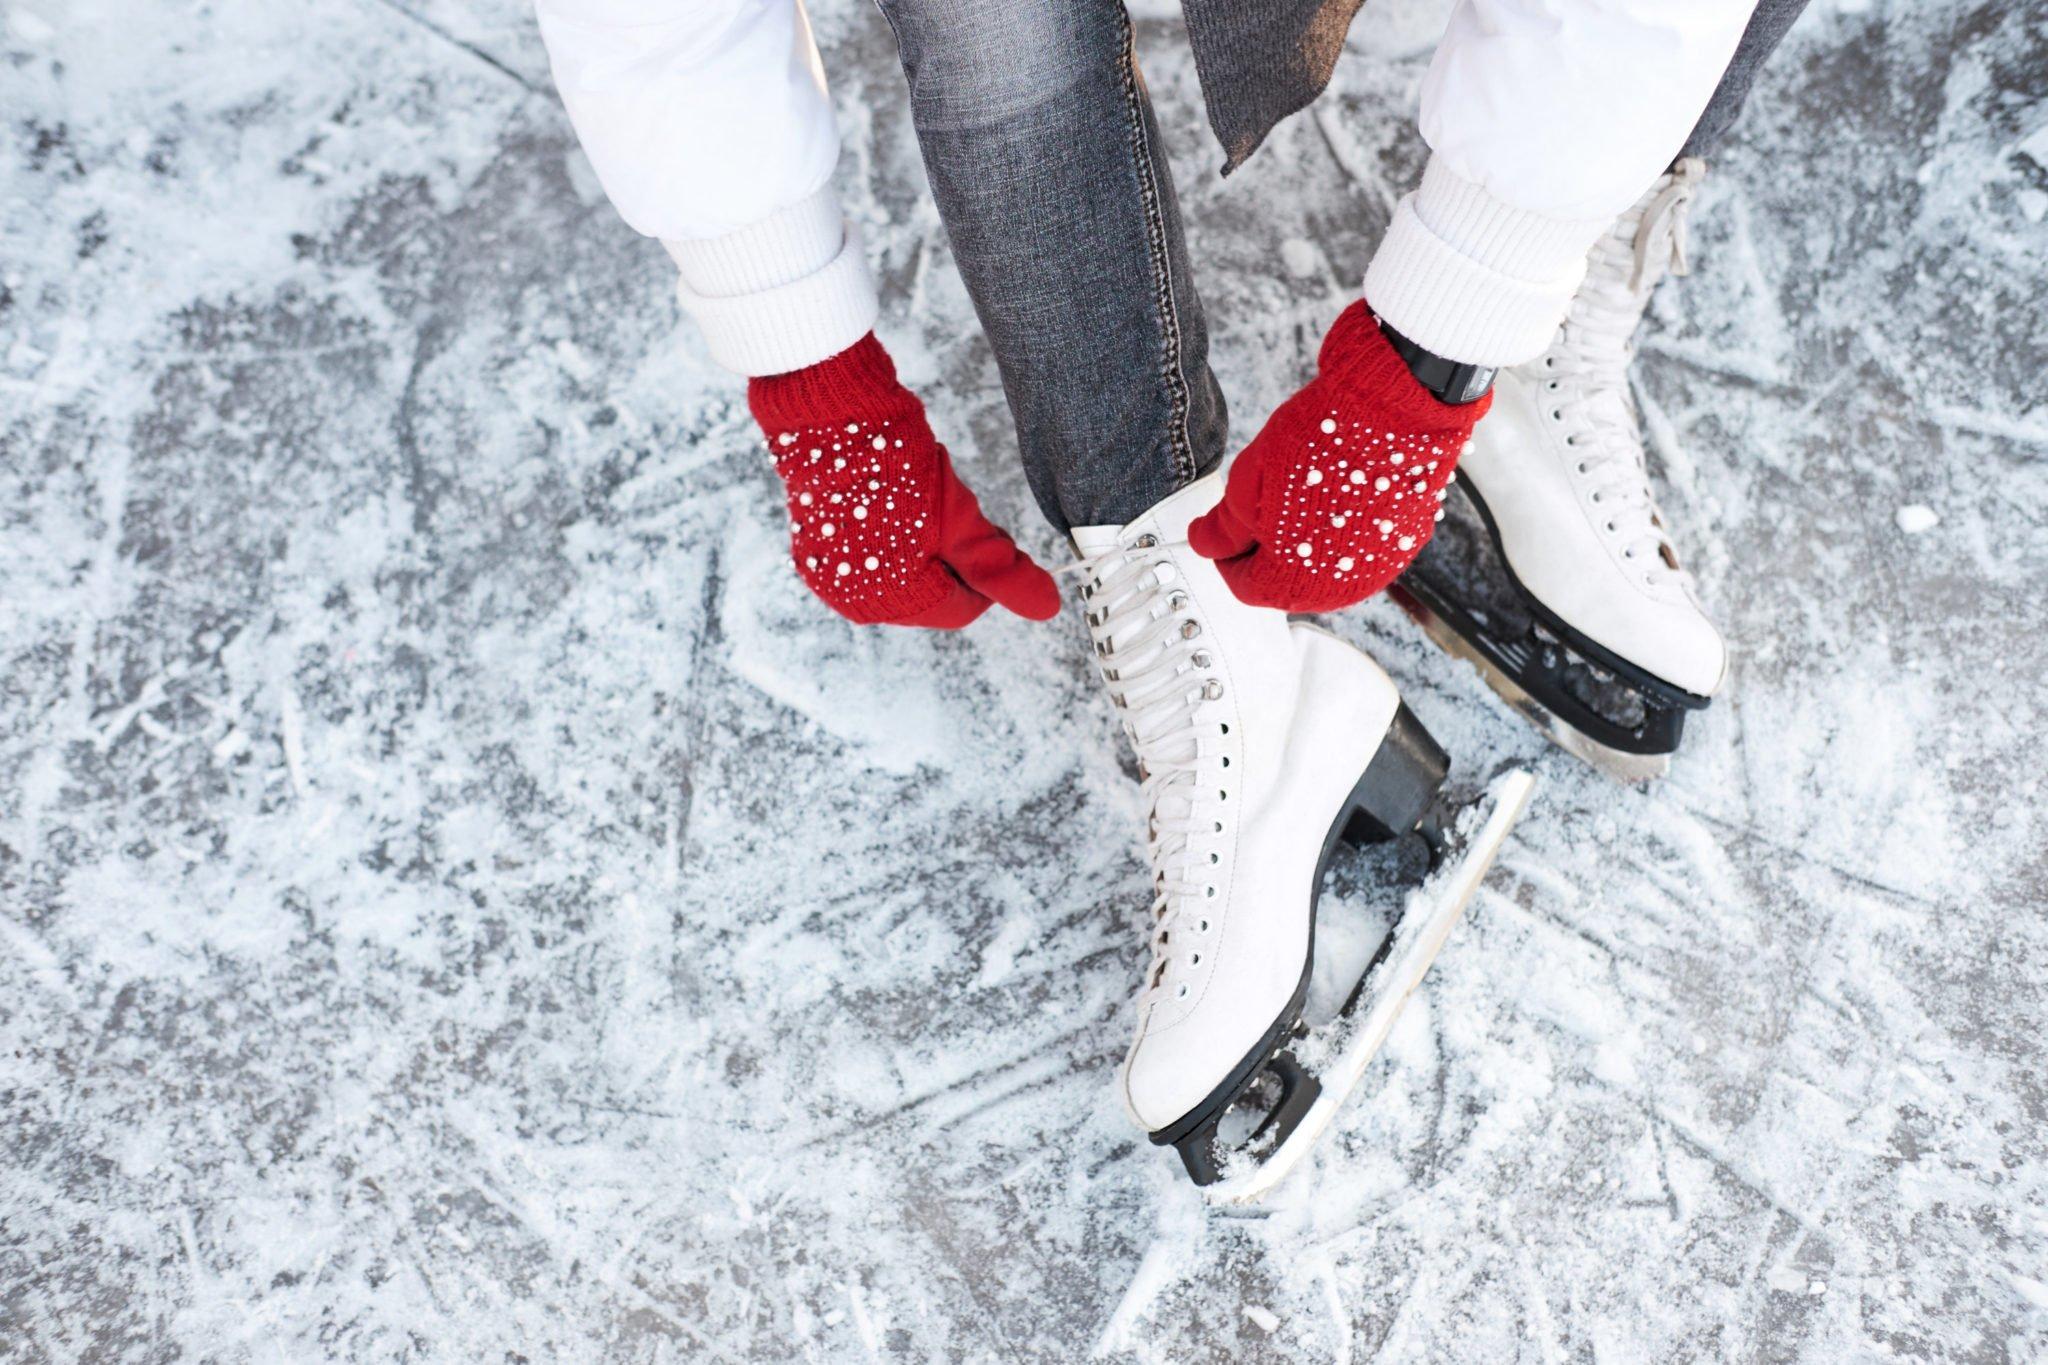 ice-skating-rinks-open-2020